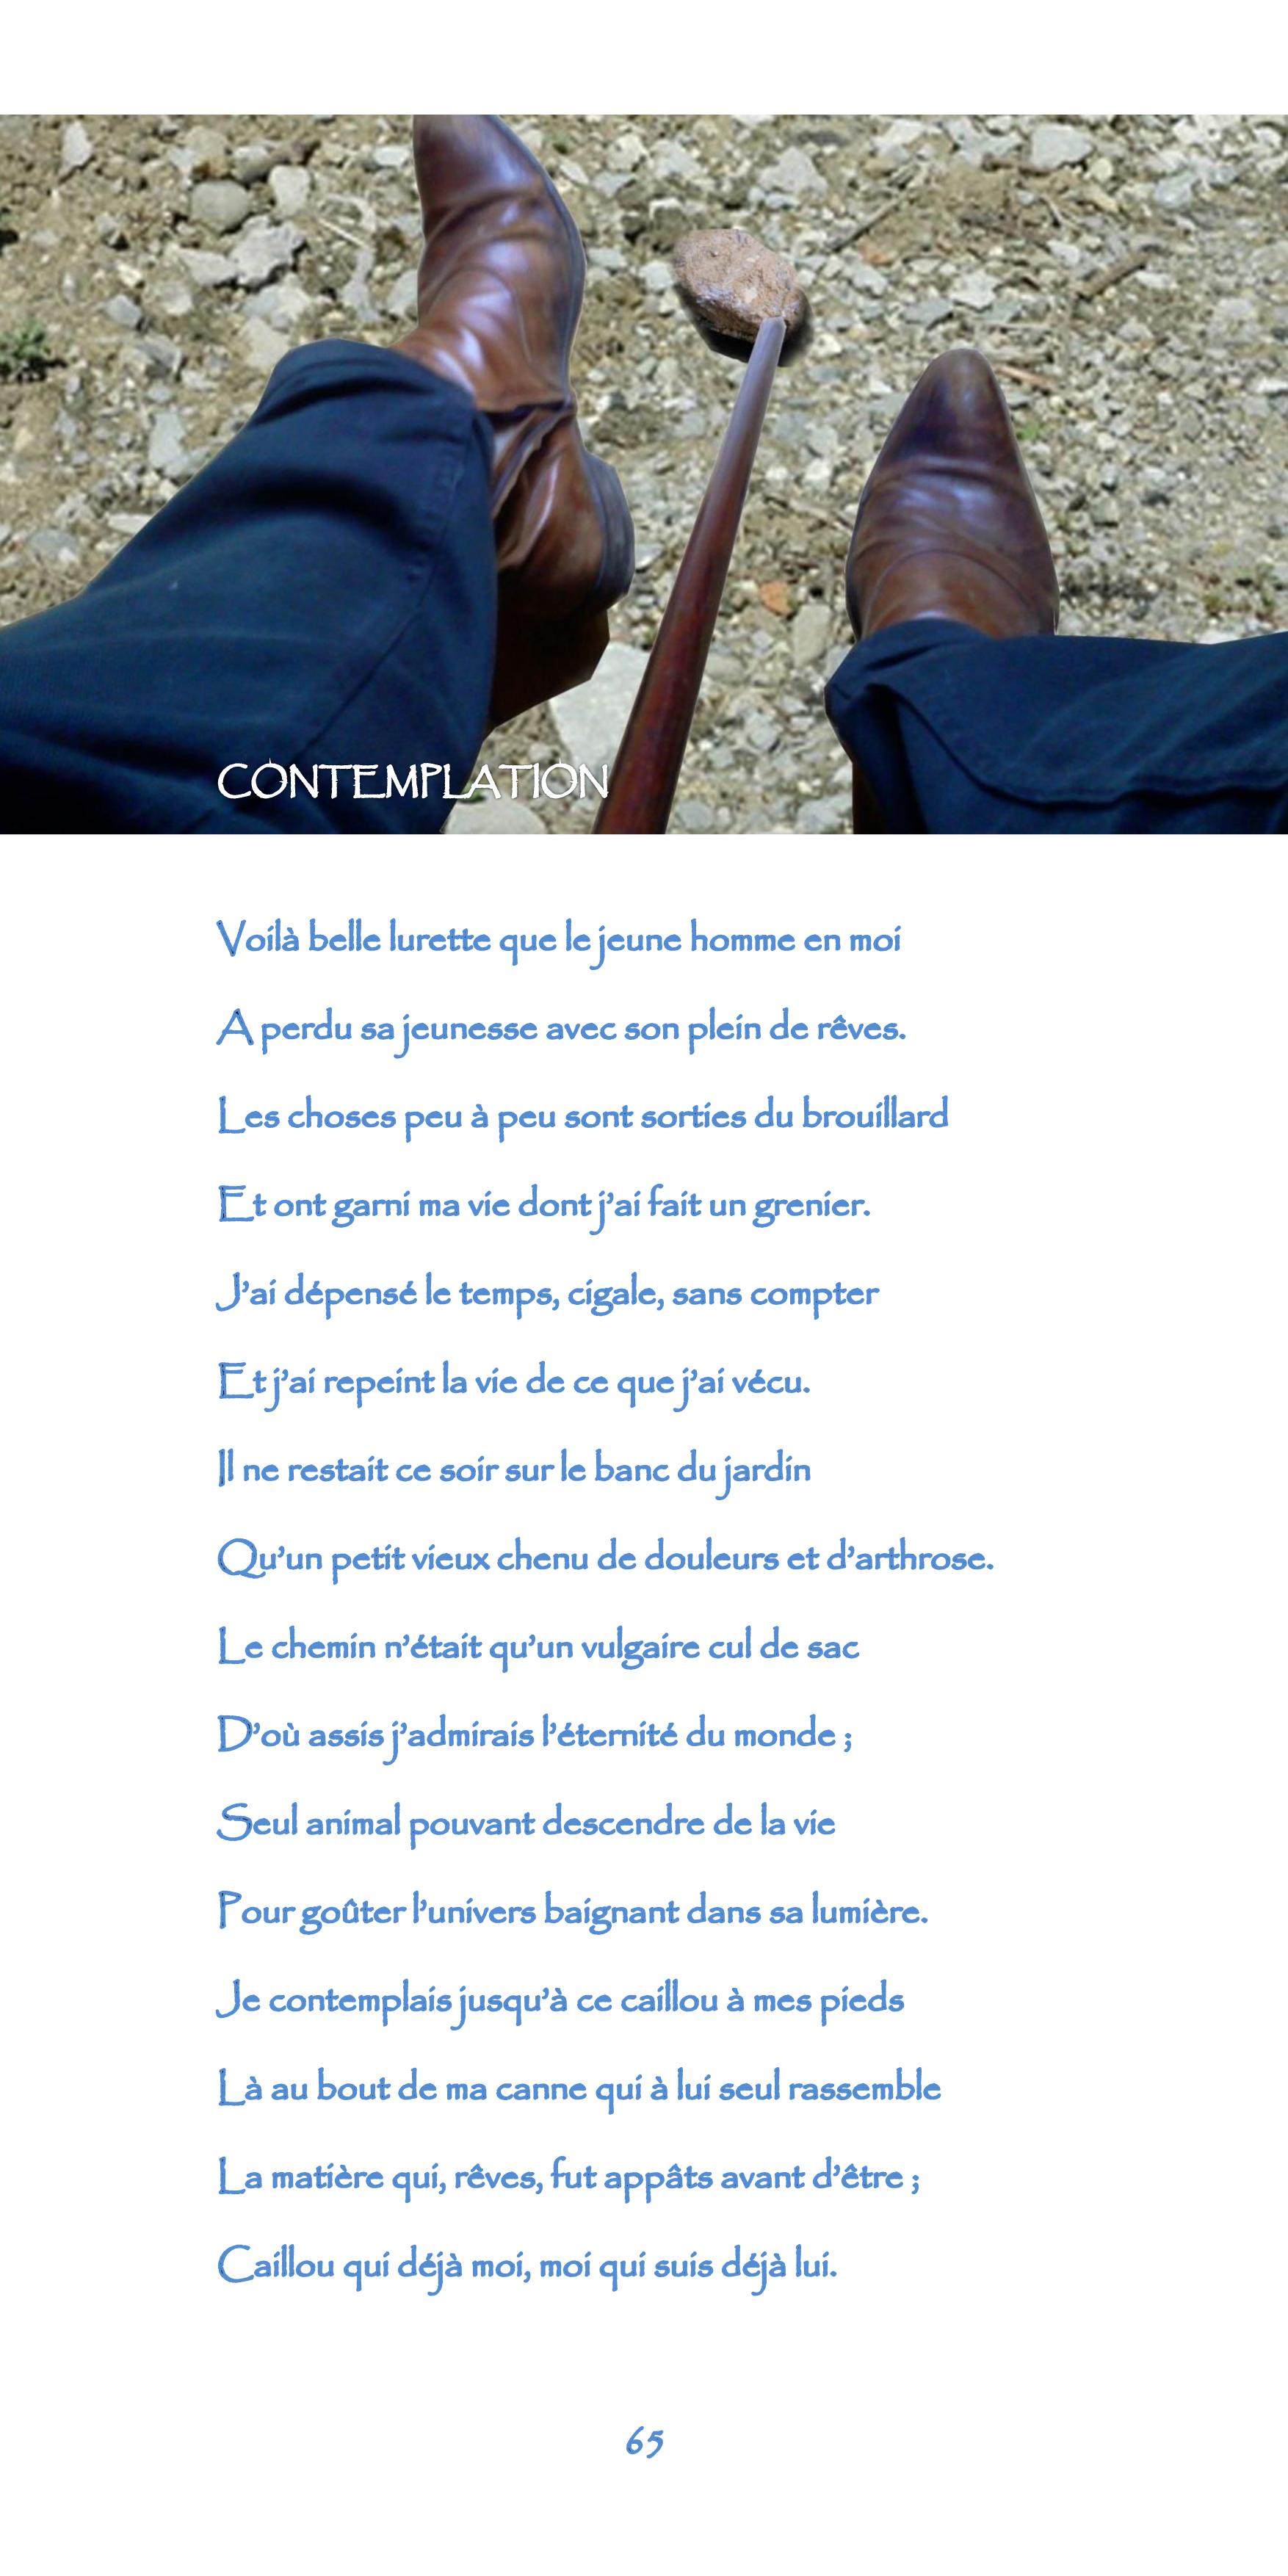 65-nègre_bleu-contemplation.jpg